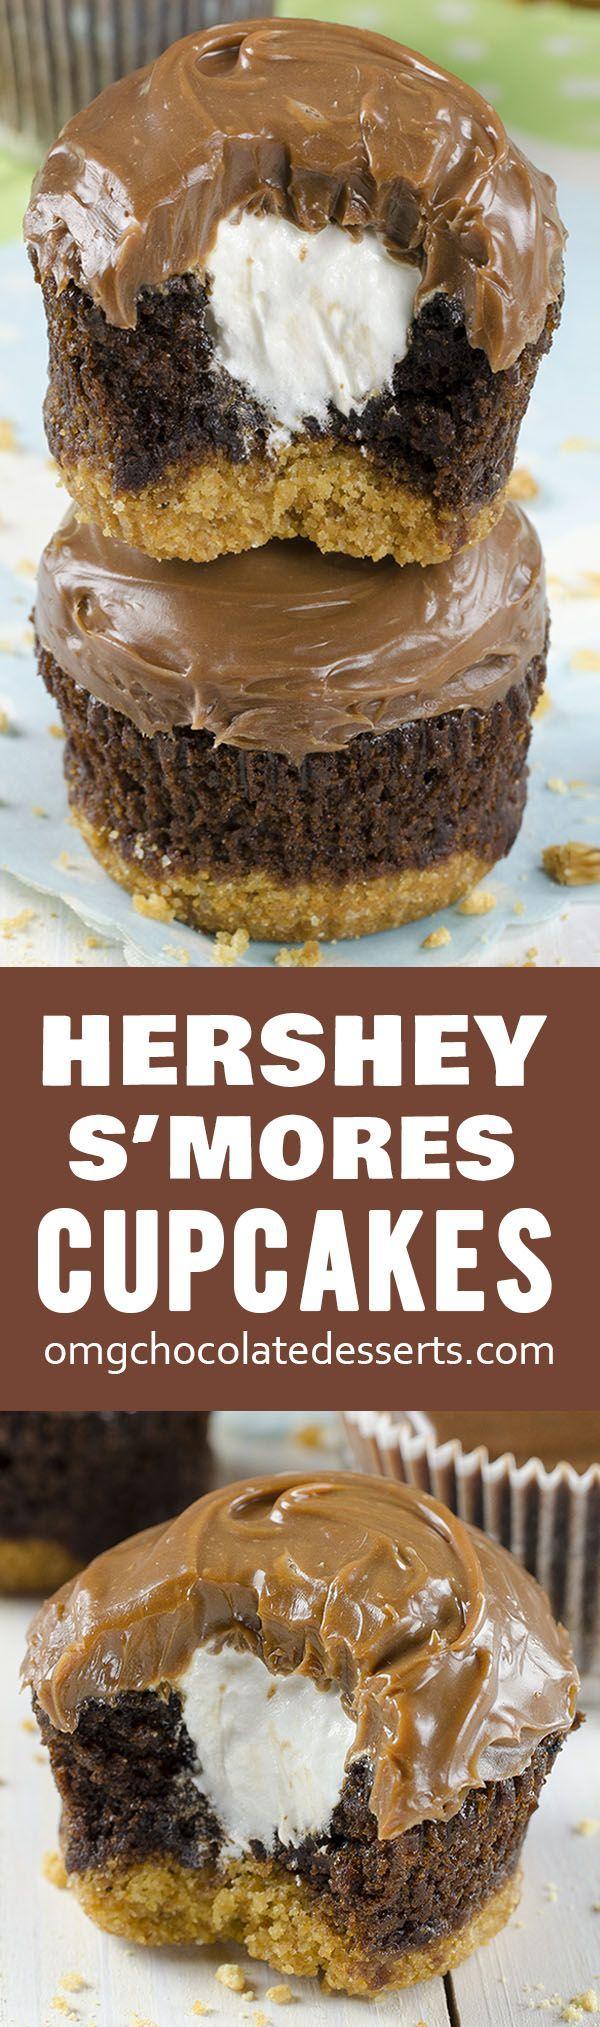 Hershey S'mores Cupcakes | Recipe | Graham cracker crust ...